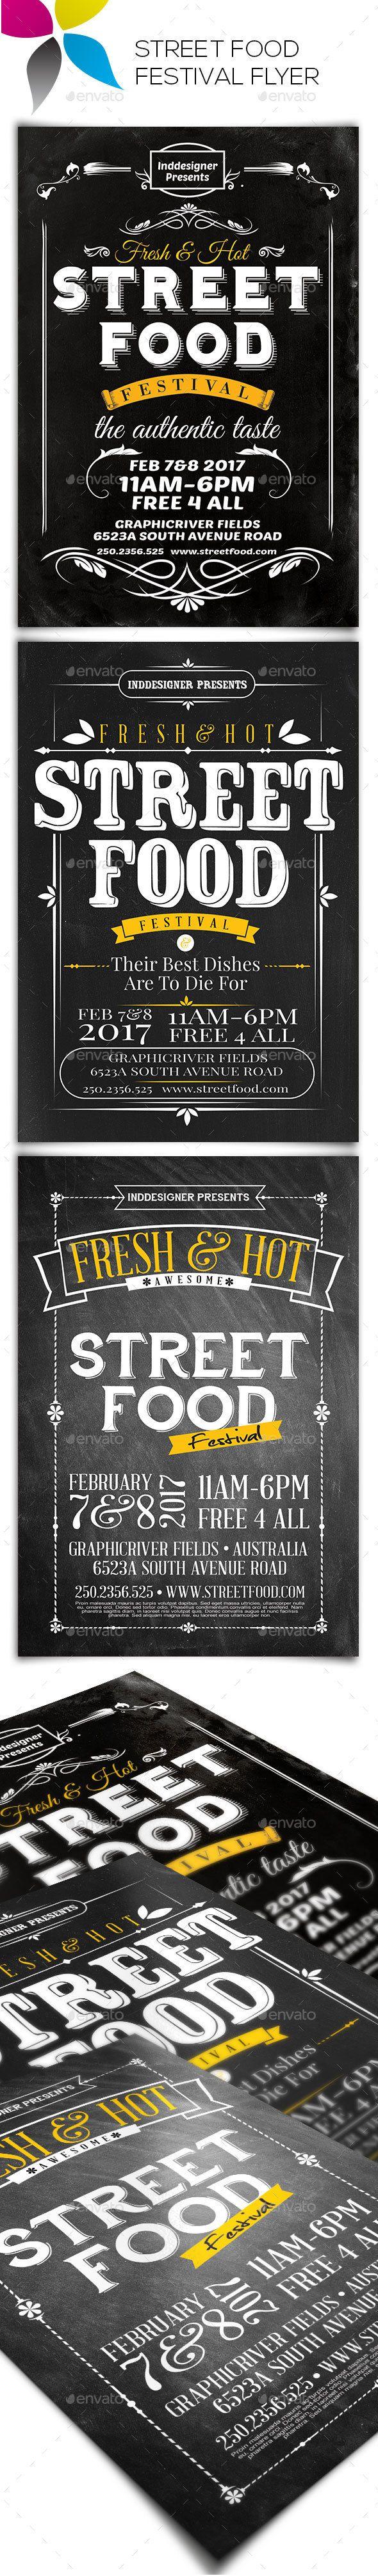 Street Food Festival Flyer - Commerce Flyers